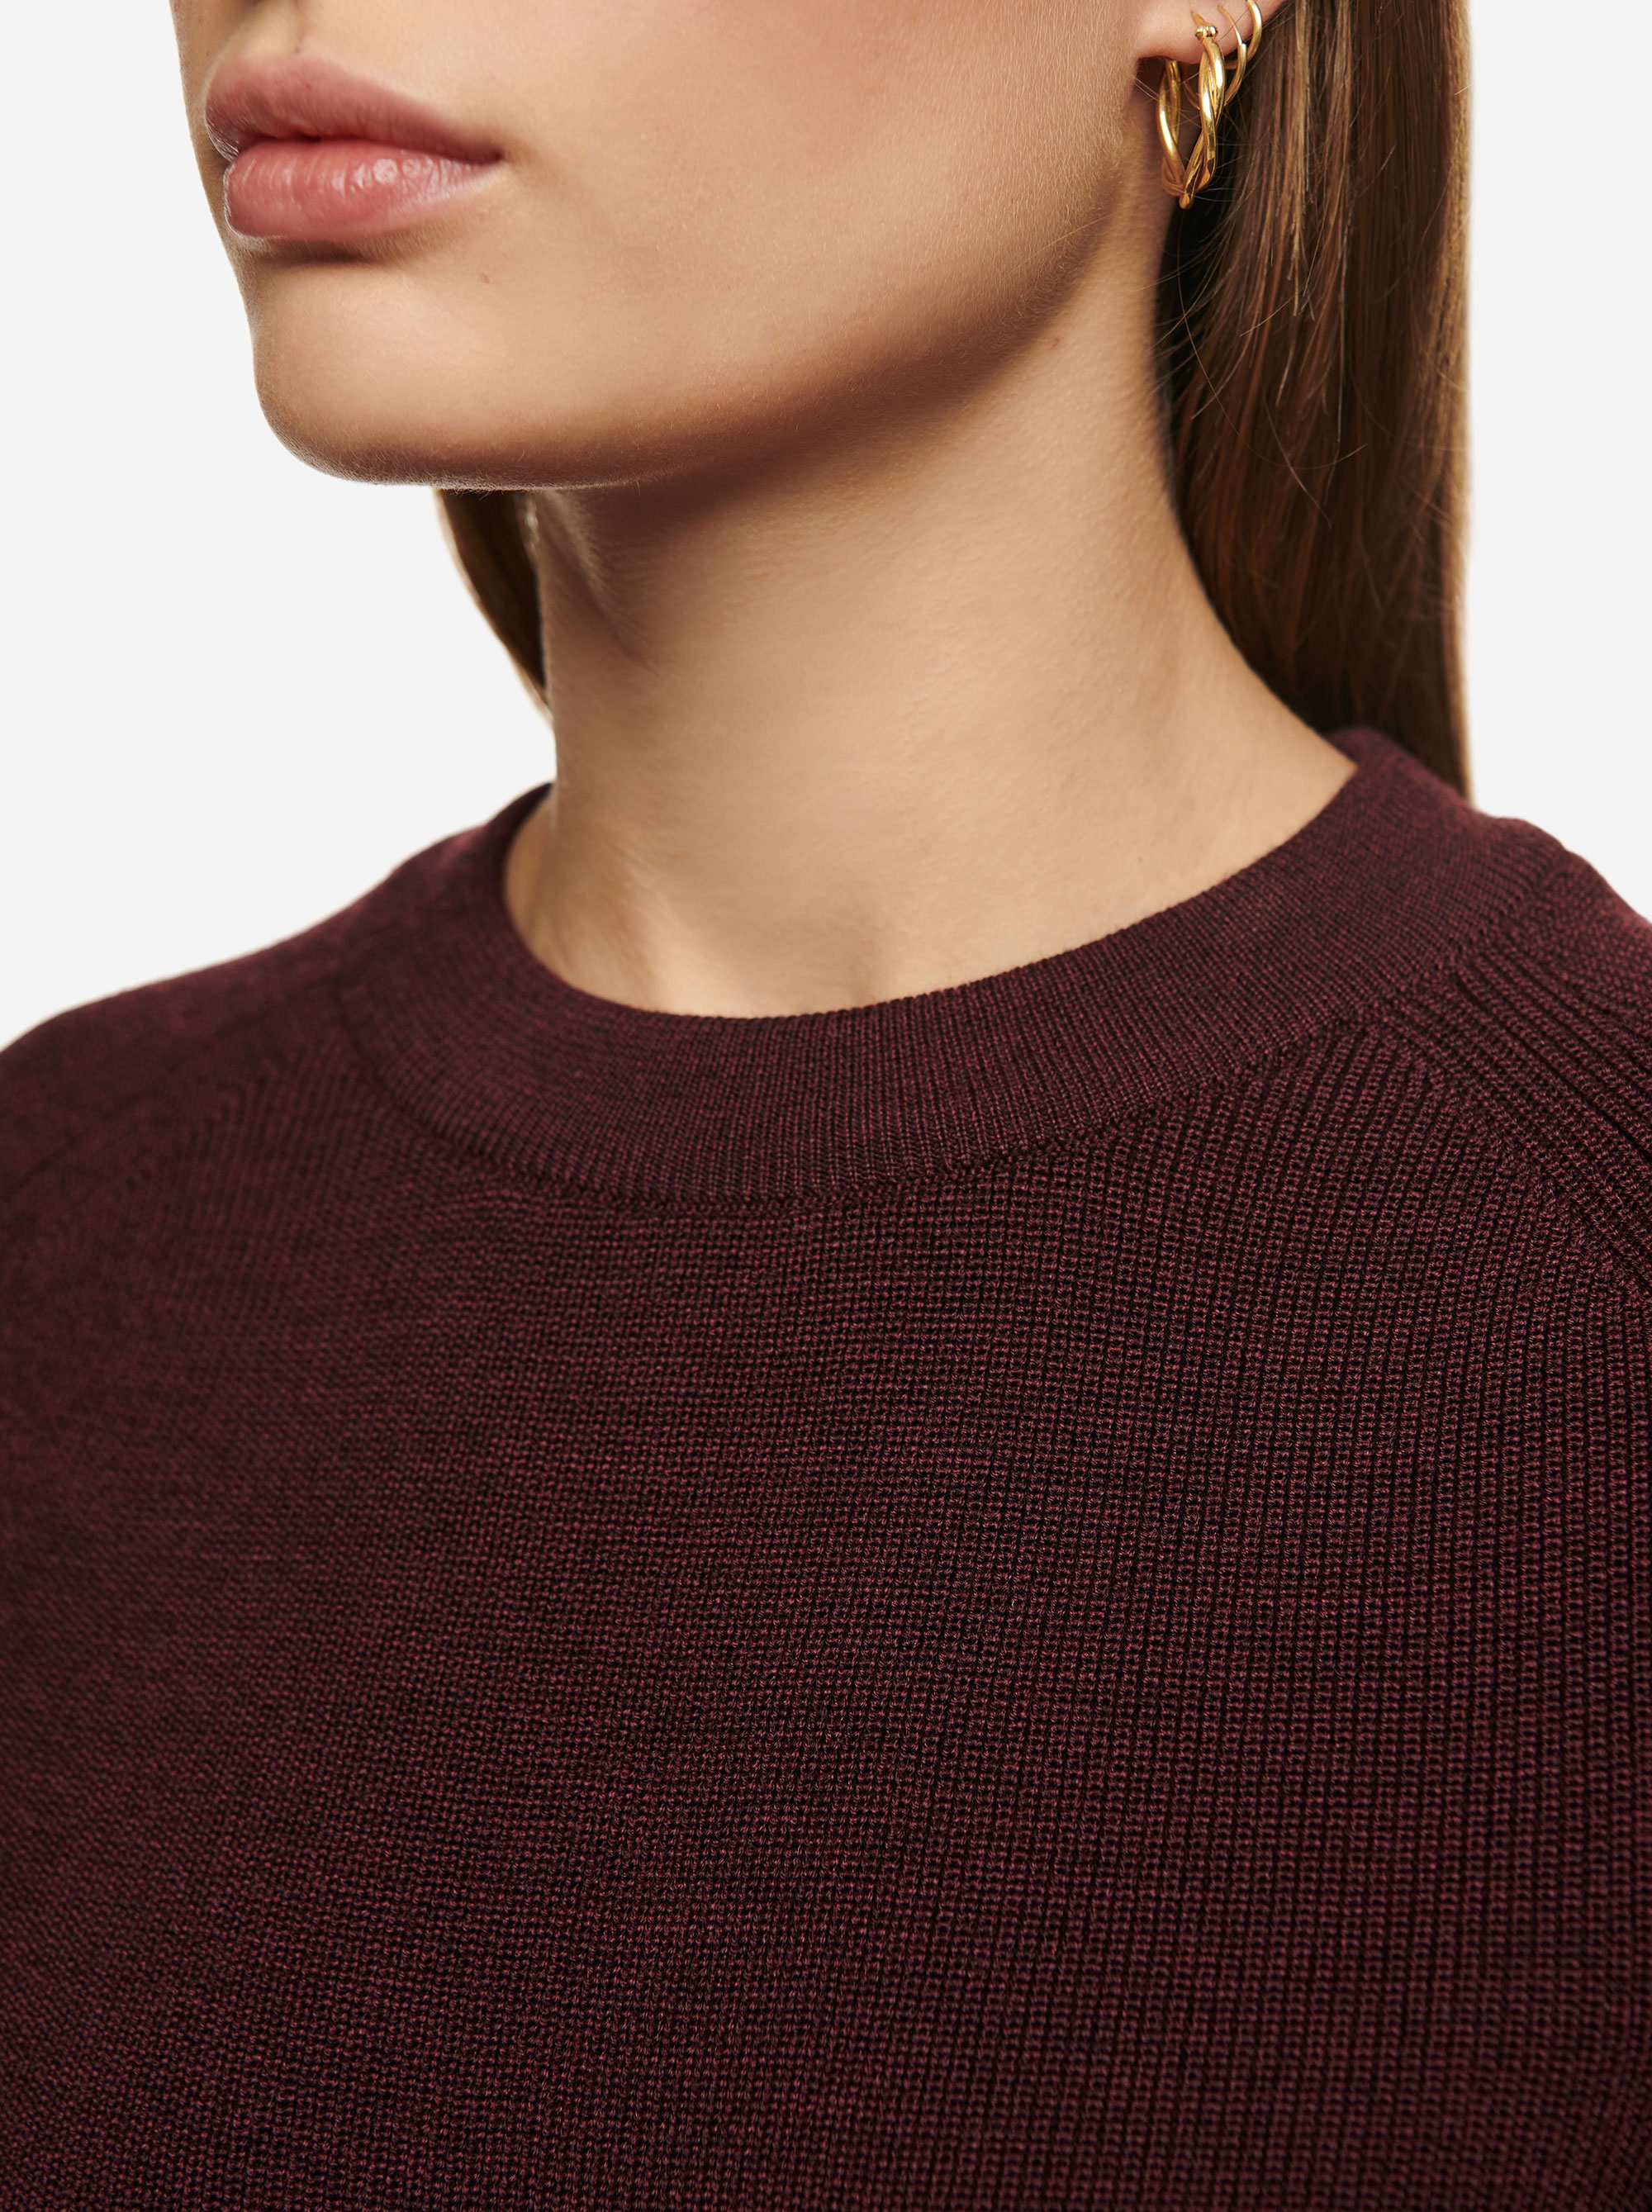 Teym - Crewneck - The Merino Sweater - Women - Burgundy - 3